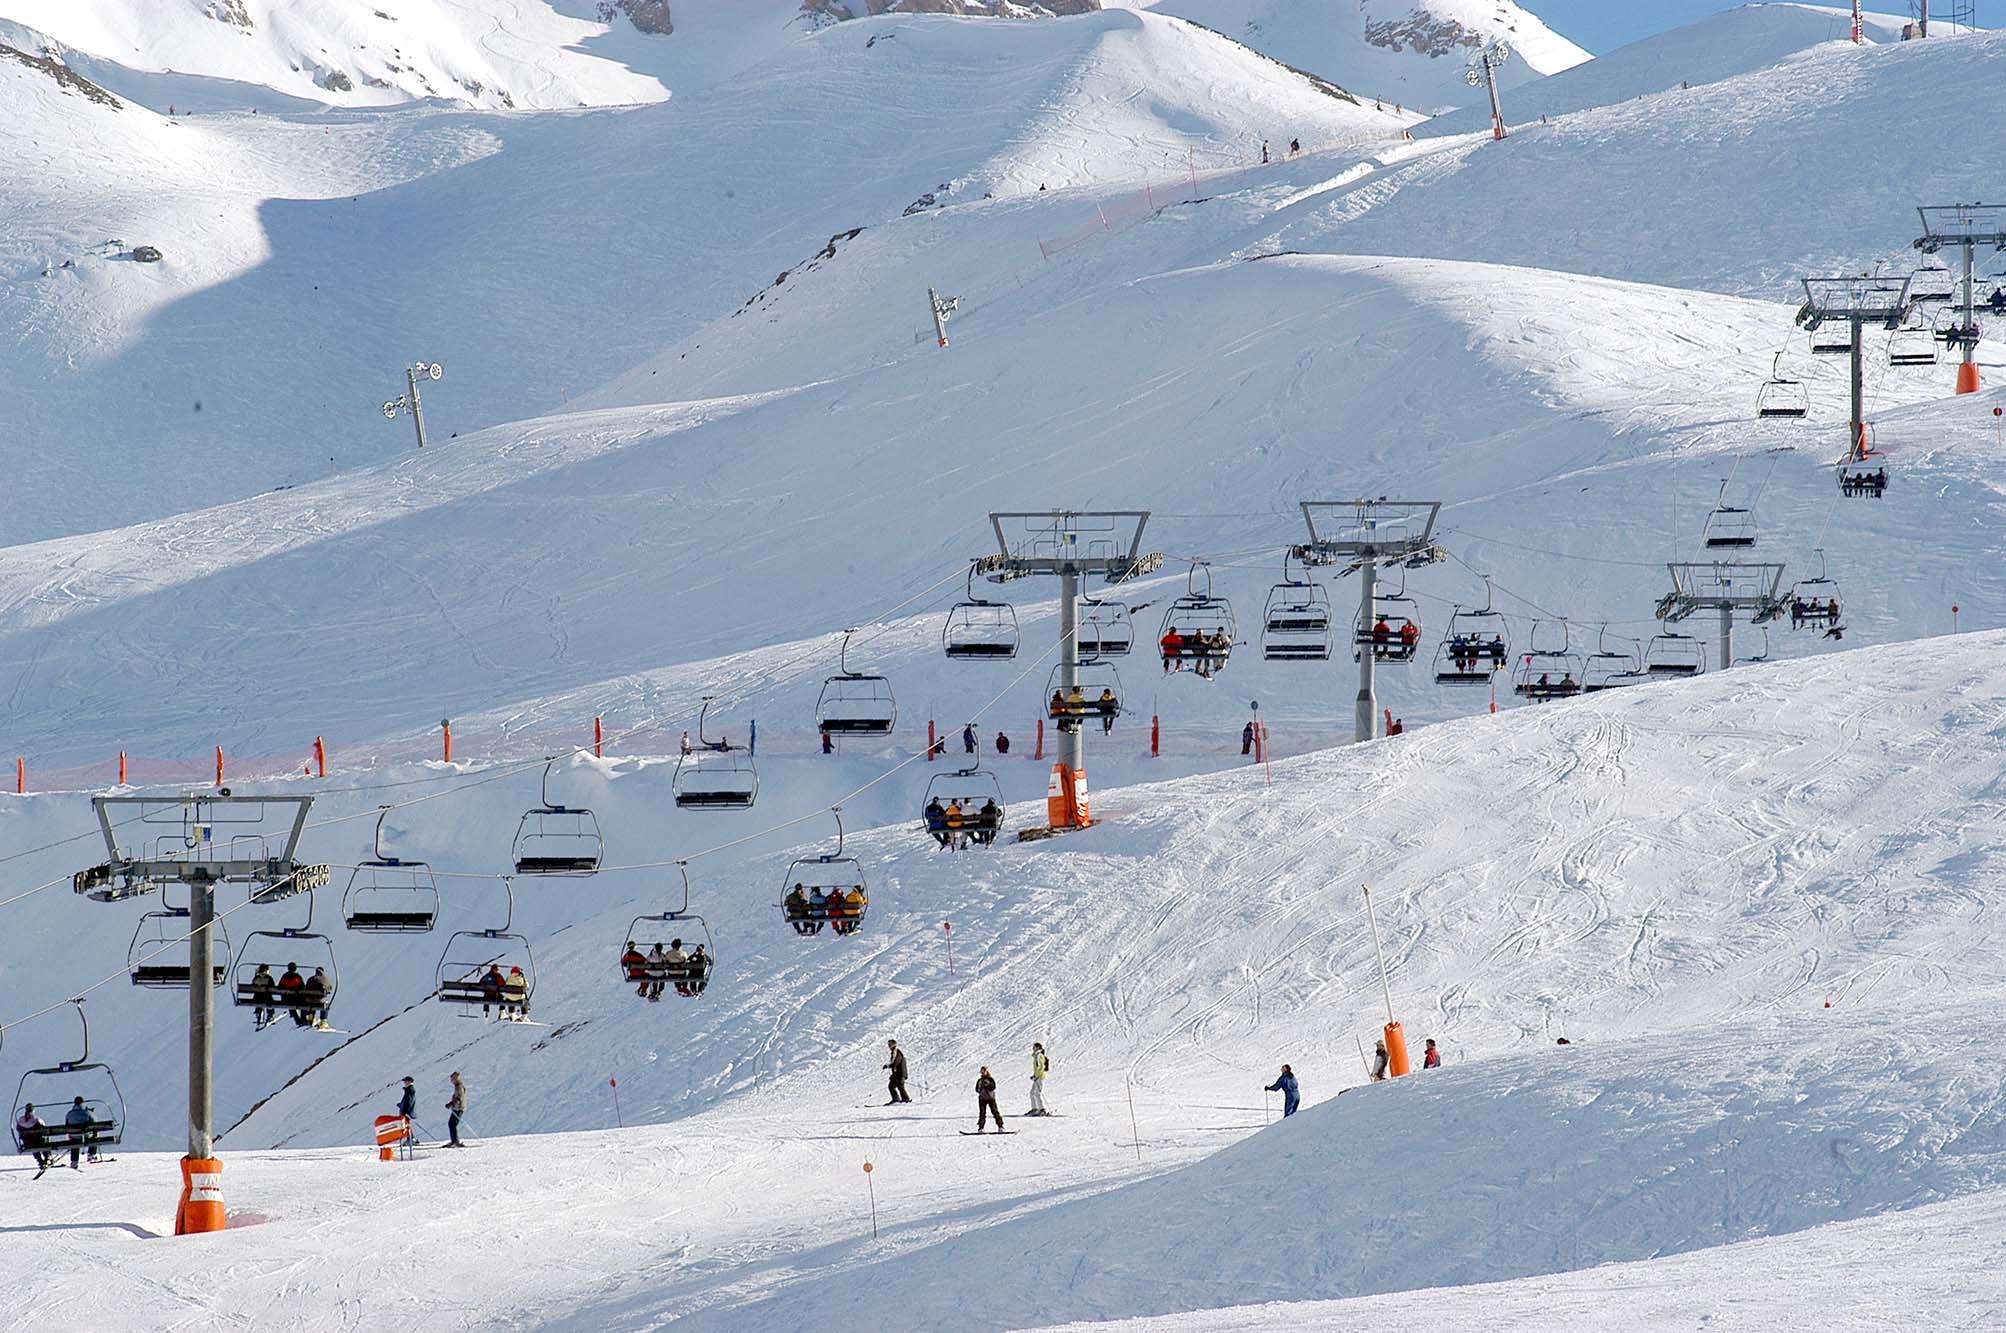 boí taüll pistas de esquí, Boí Taüll ski slopes